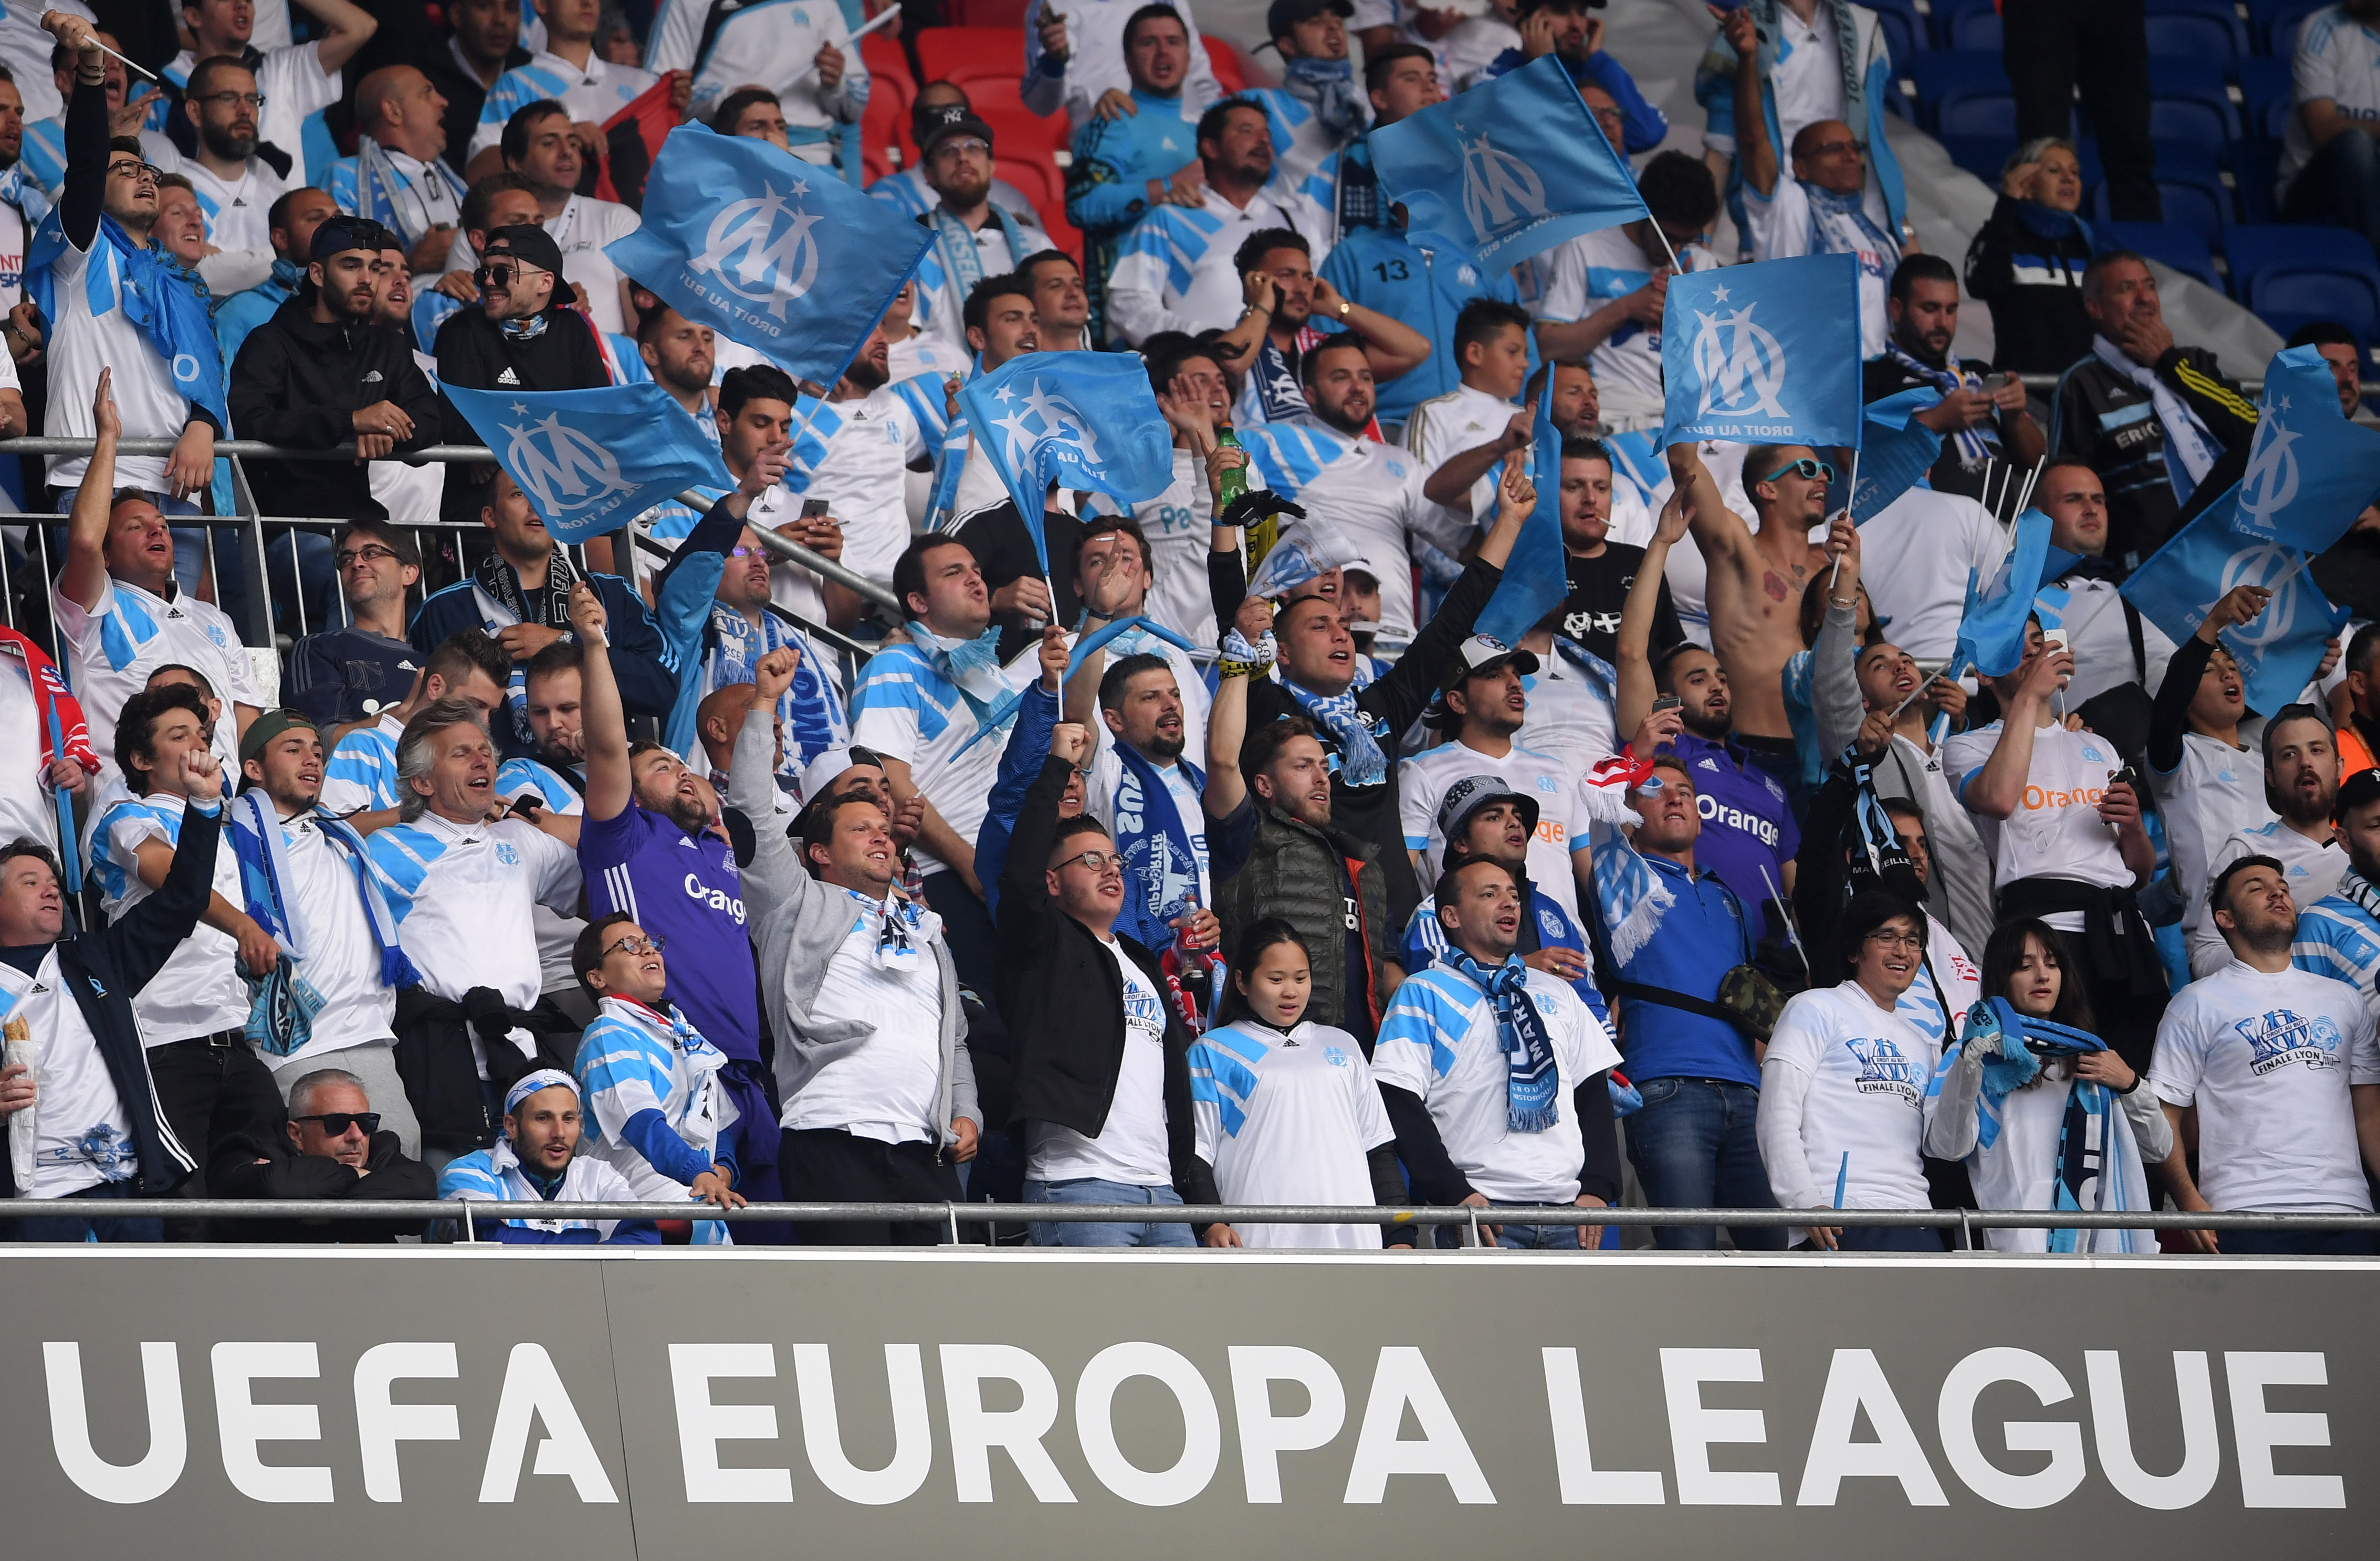 Olympique Marseille Atletico Madrid UEFA Europa League Finale Fans